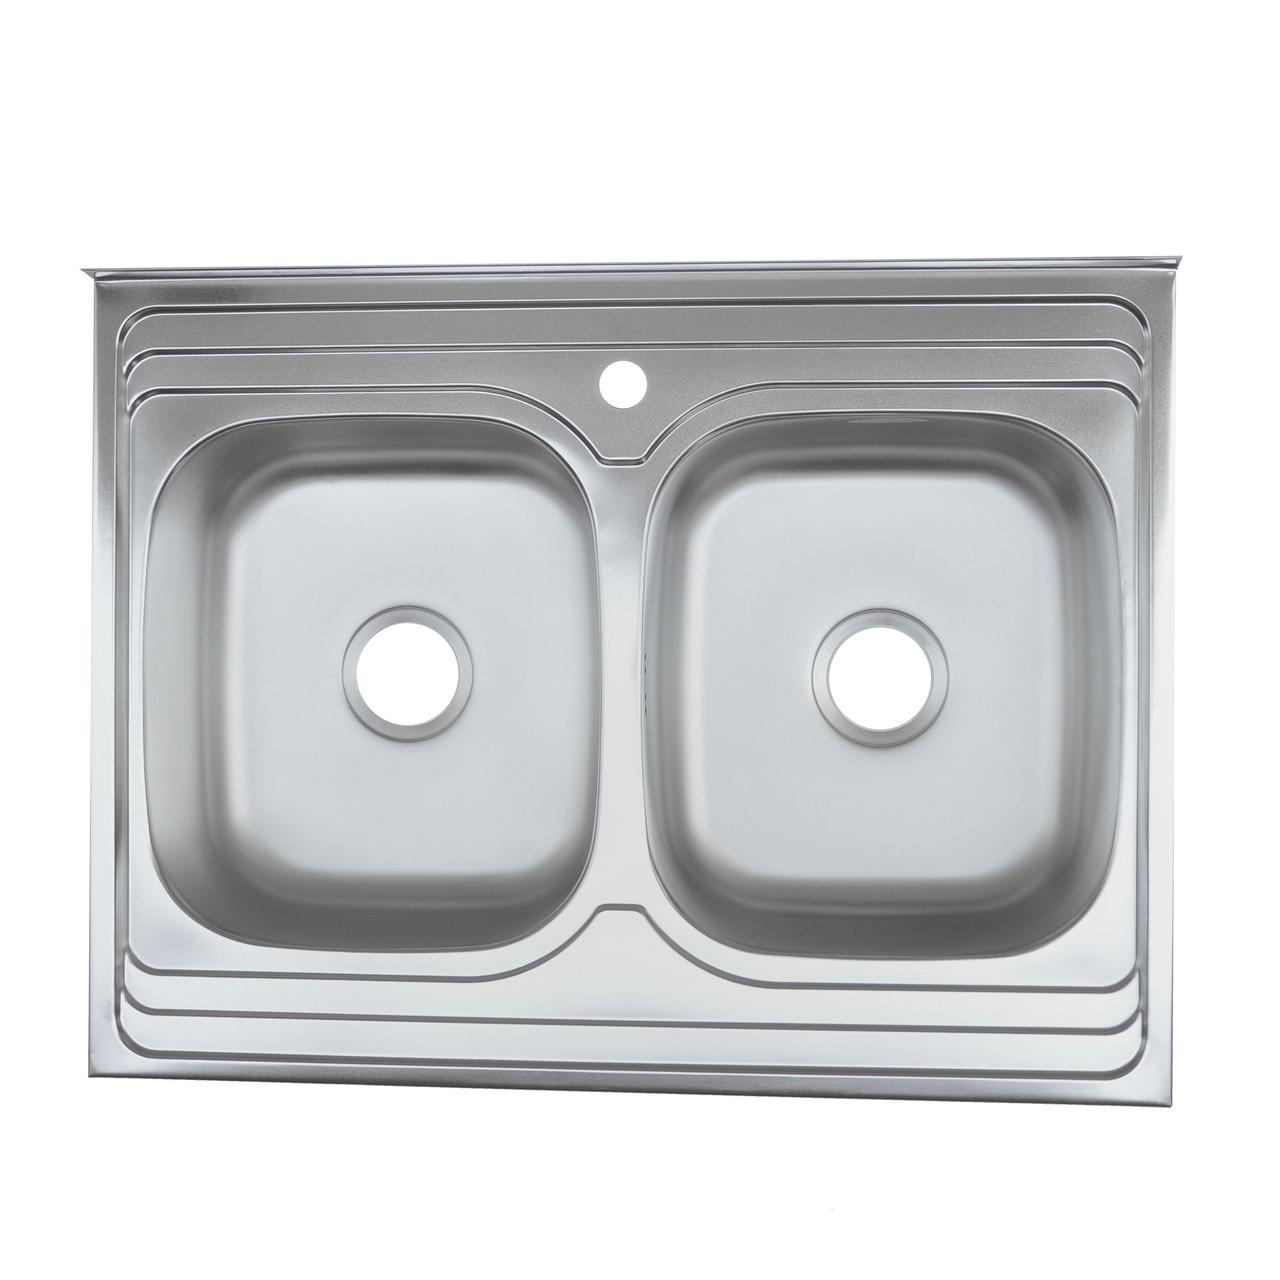 Кухонная мойка Platinum 8060D Polish 0,7мм двойная накладная